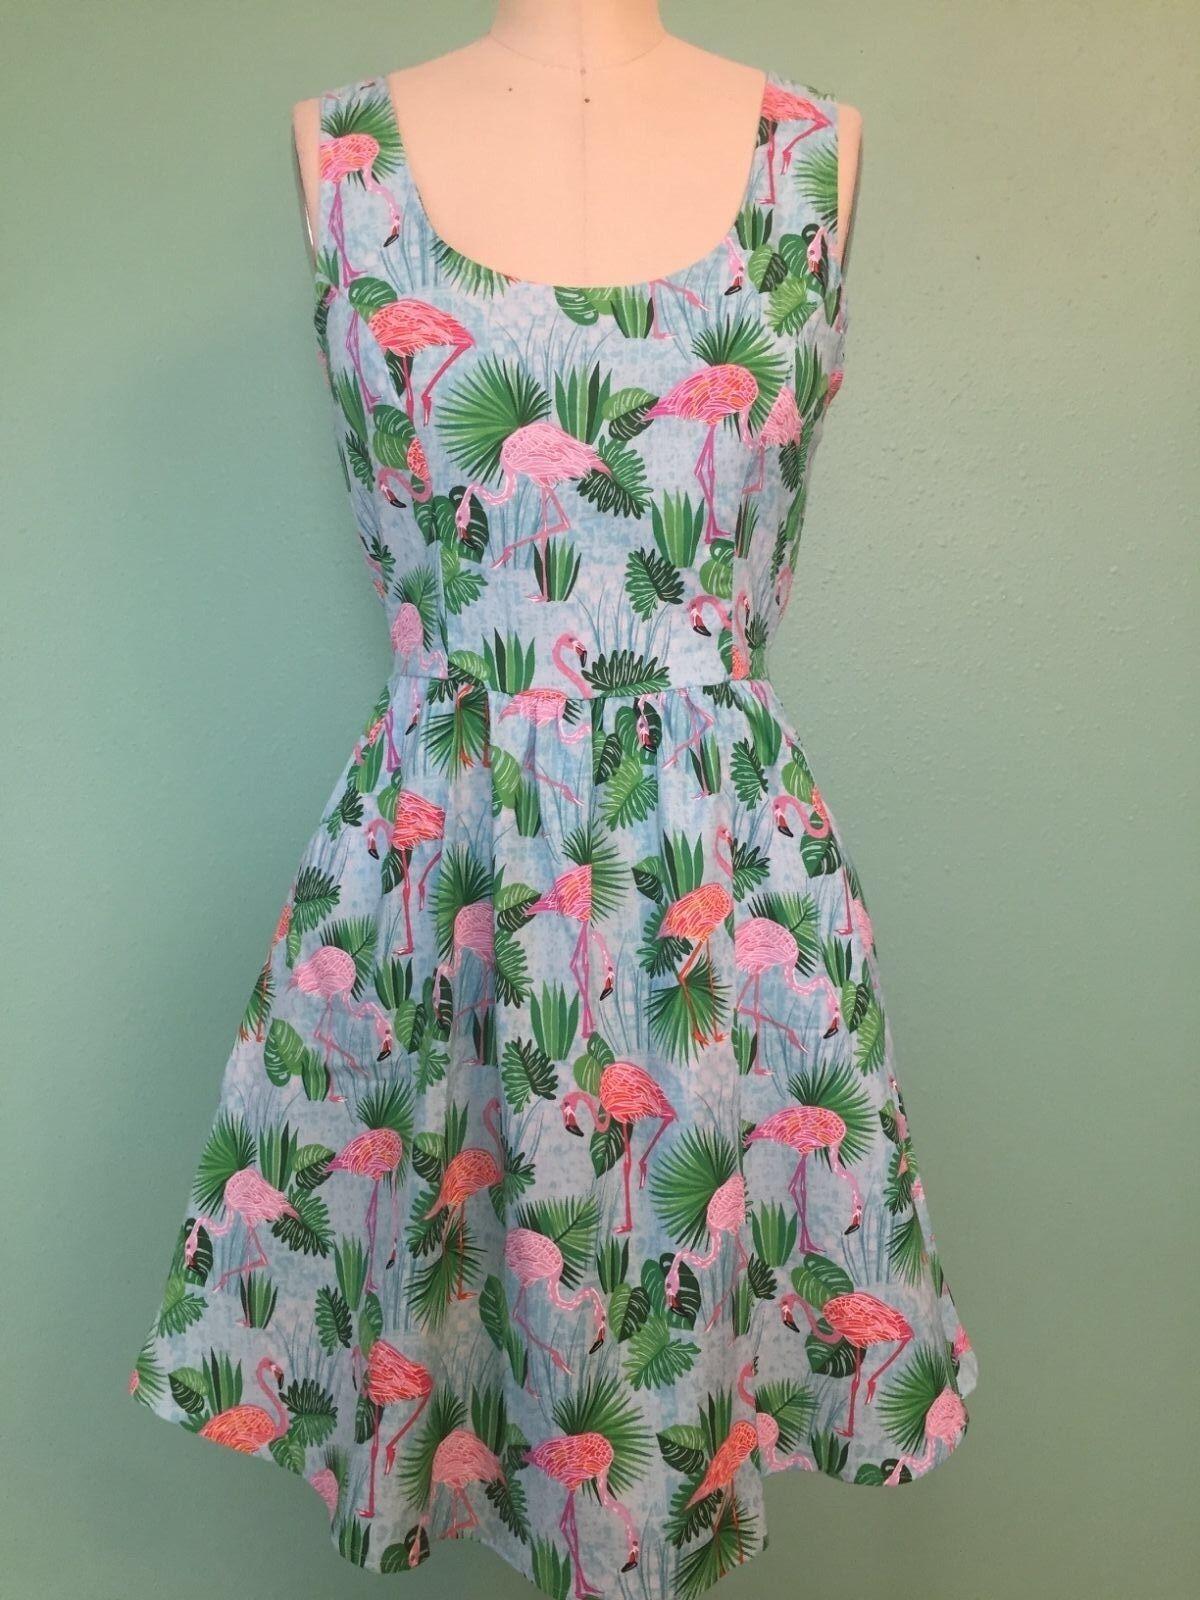 NWT Folter Retrolicious Flamingo Party Dress retro vintage style